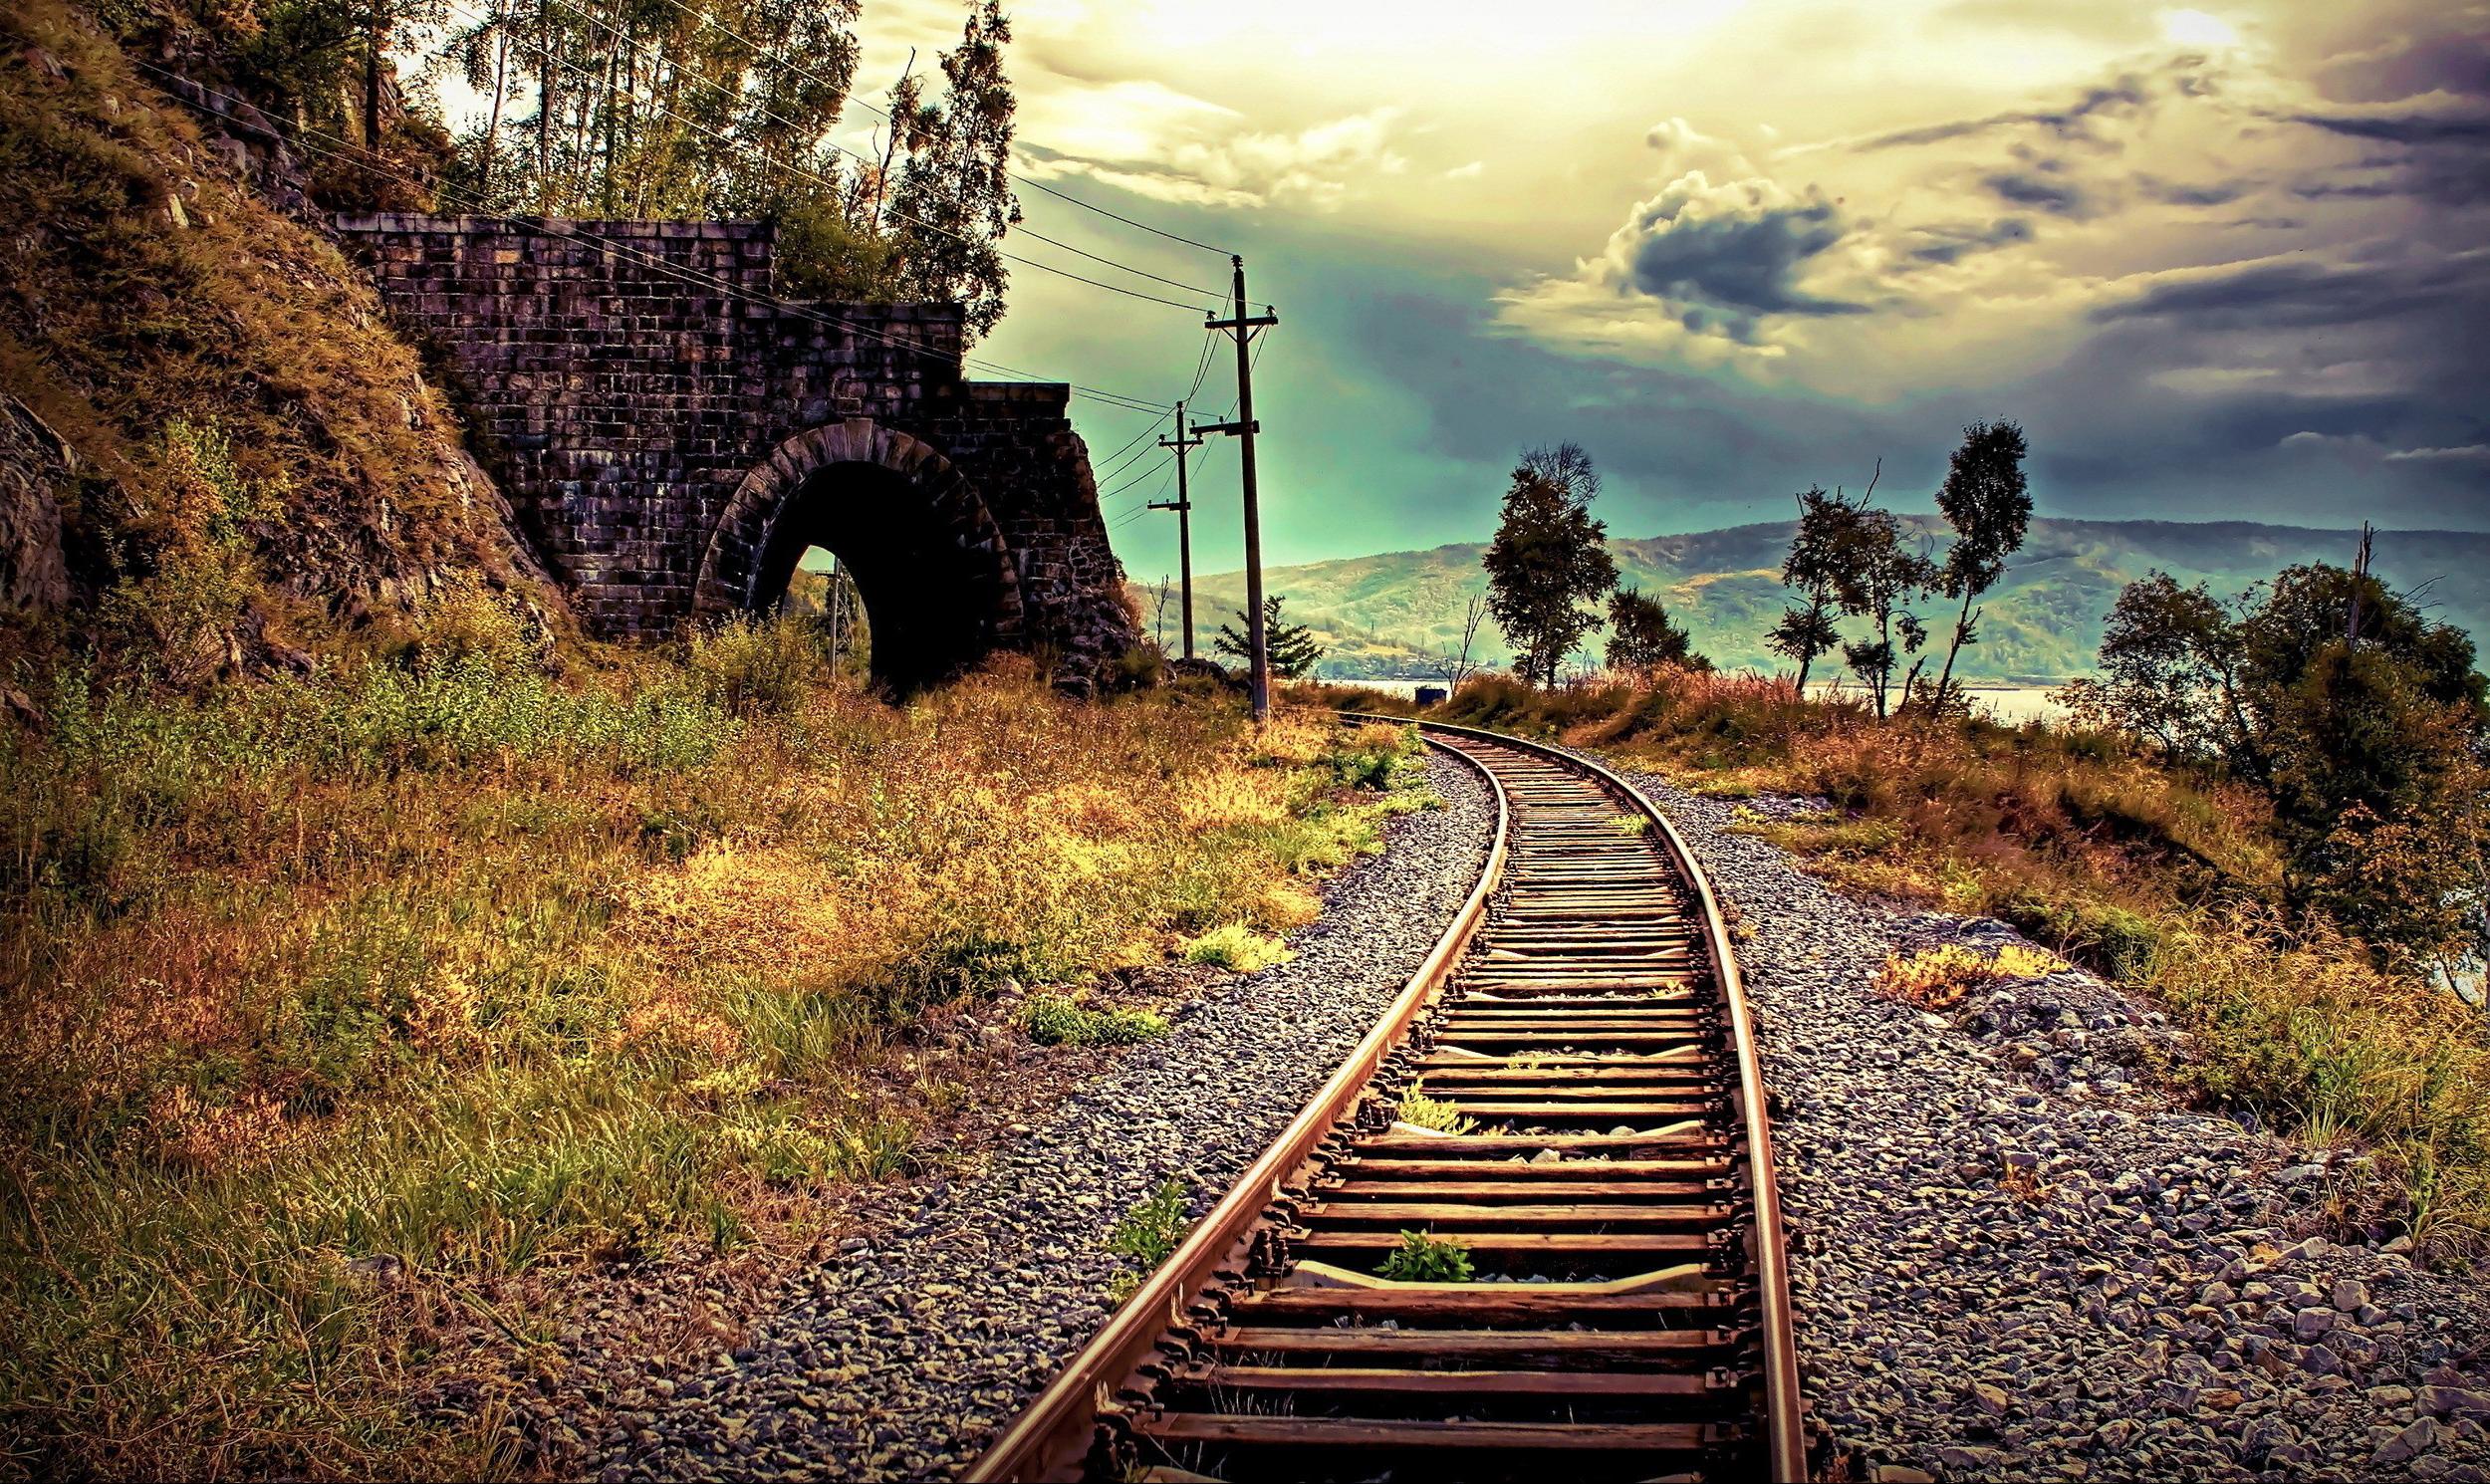 Tracks For Vehicles >> HD Train Tracks Wallpaper - WallpaperSafari